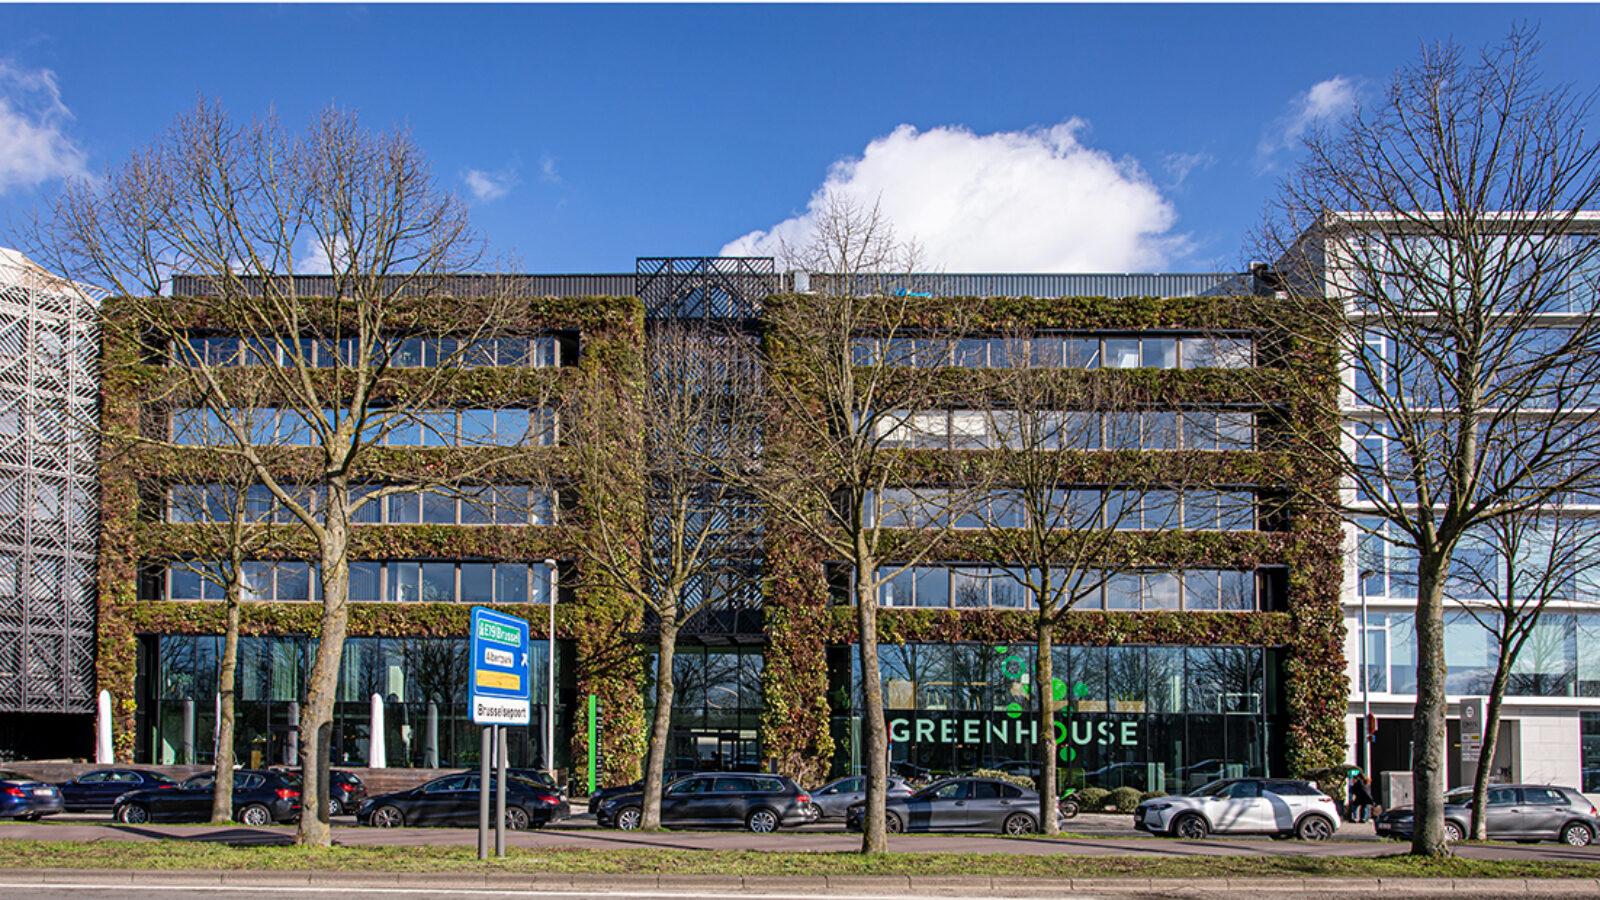 Greenhouse Antwerp